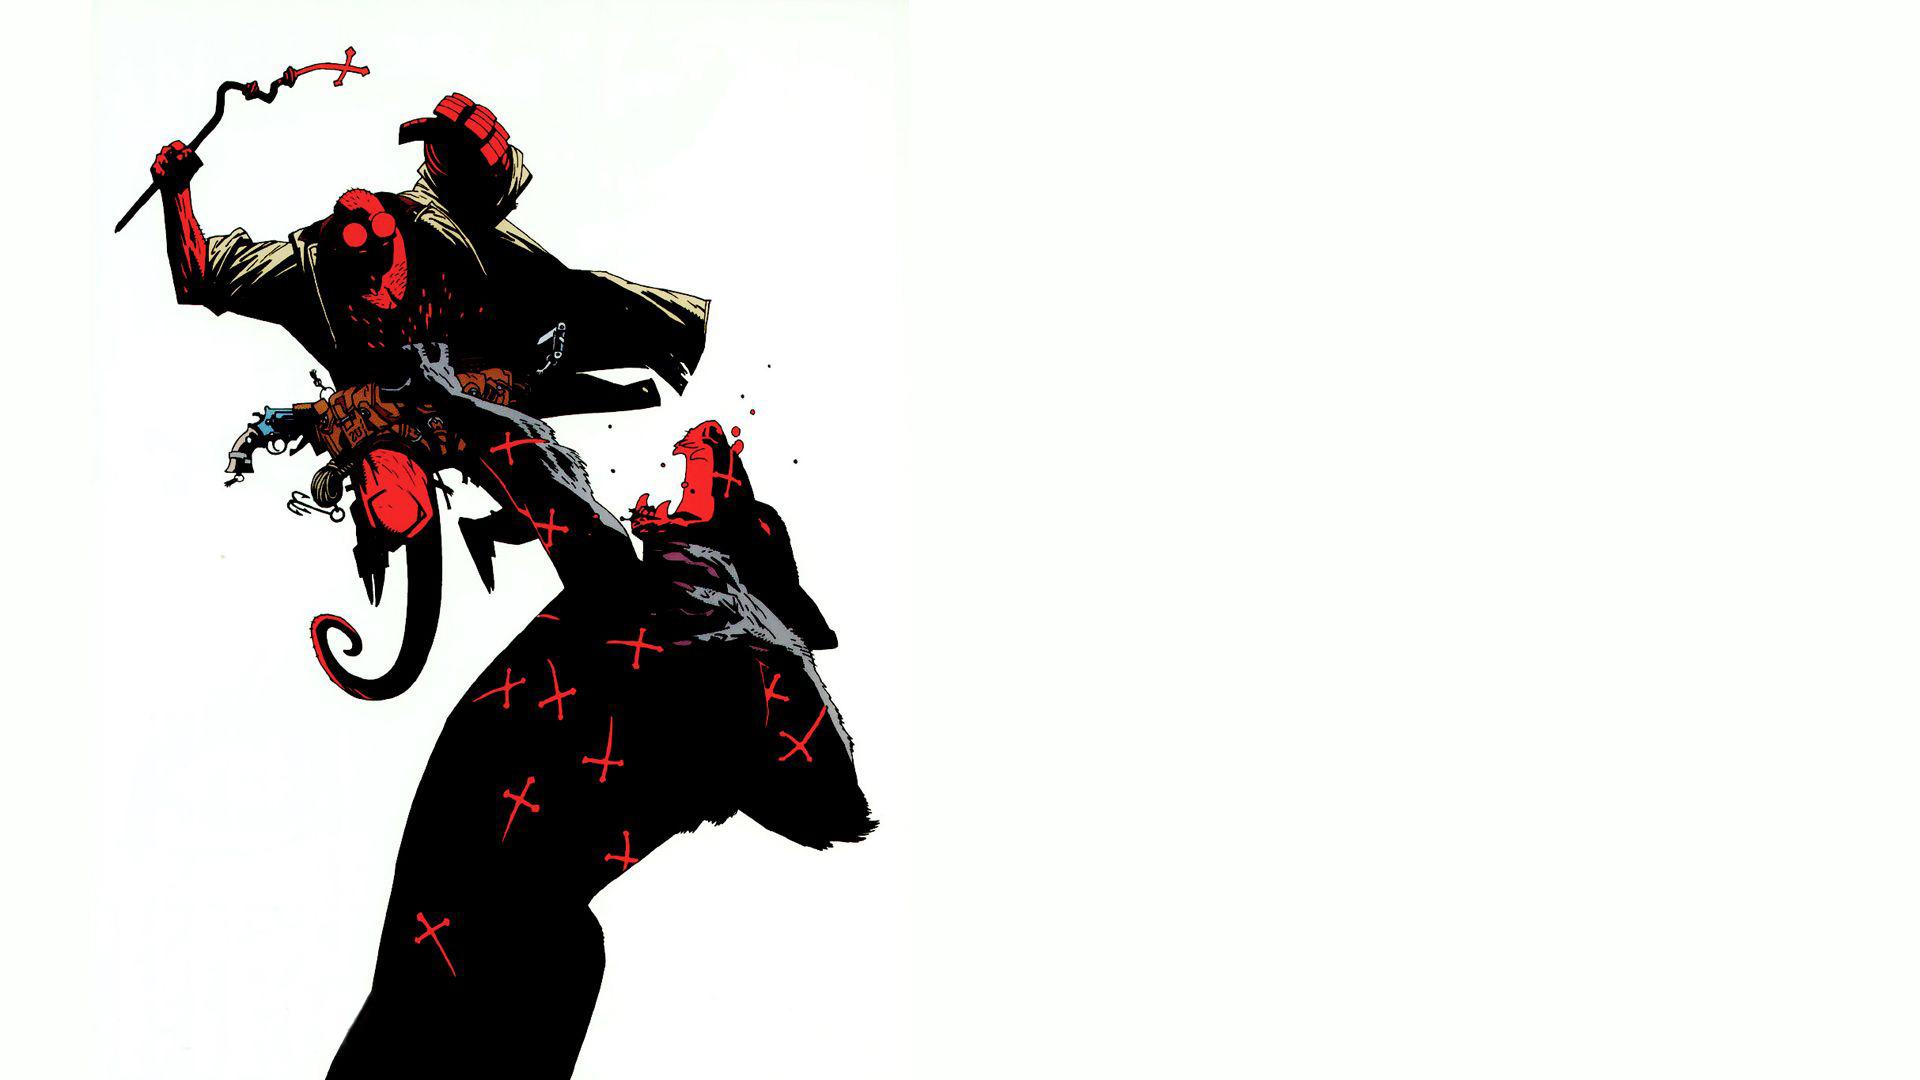 Hellboy wallpaper 17994 1920x1080